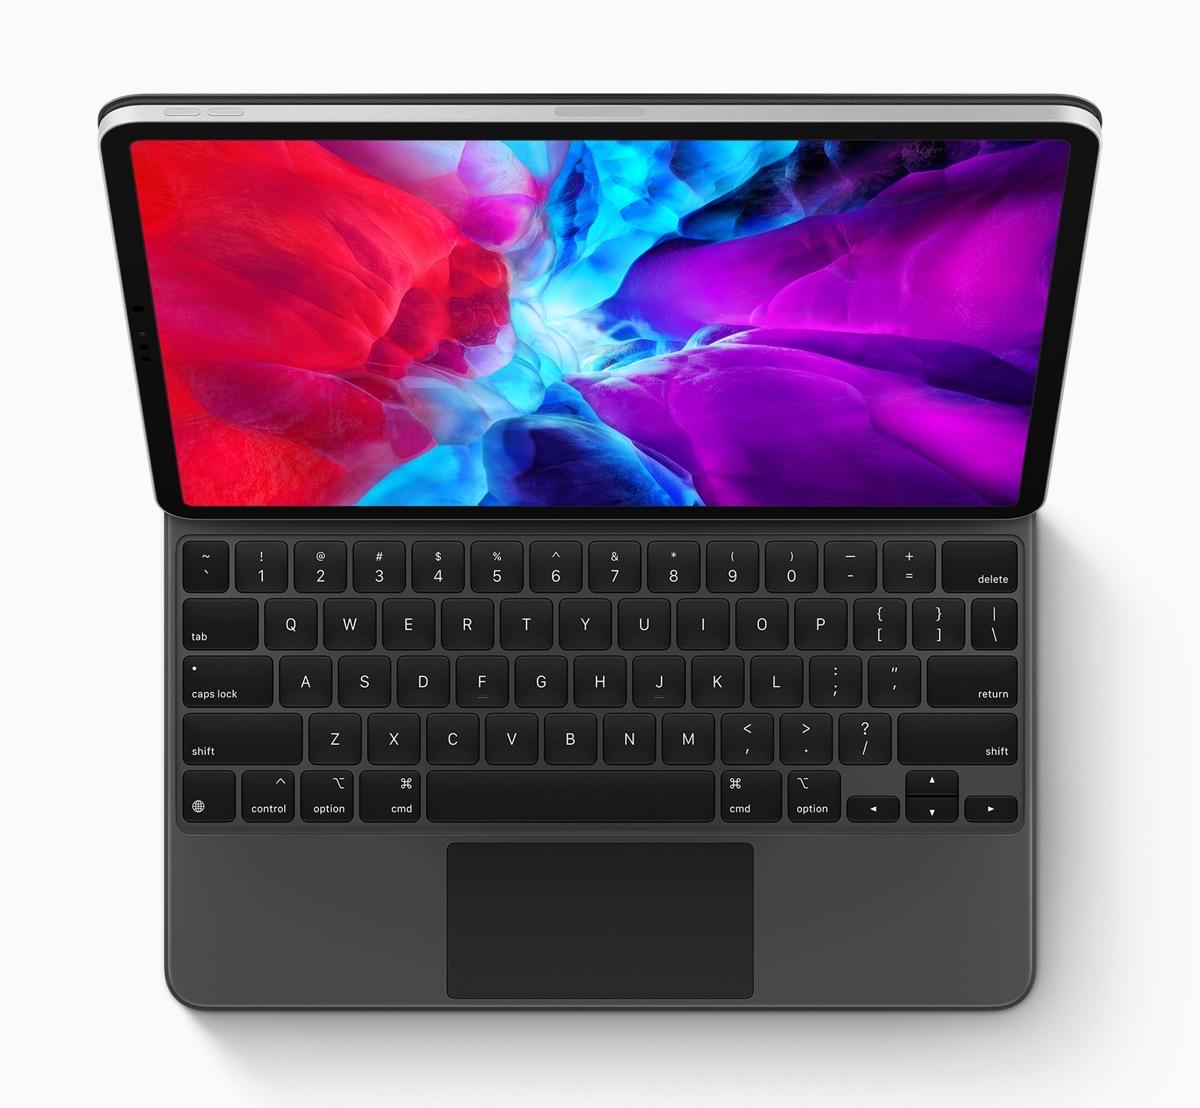 Image of iPad Pro 2020 with Magic Keyboard